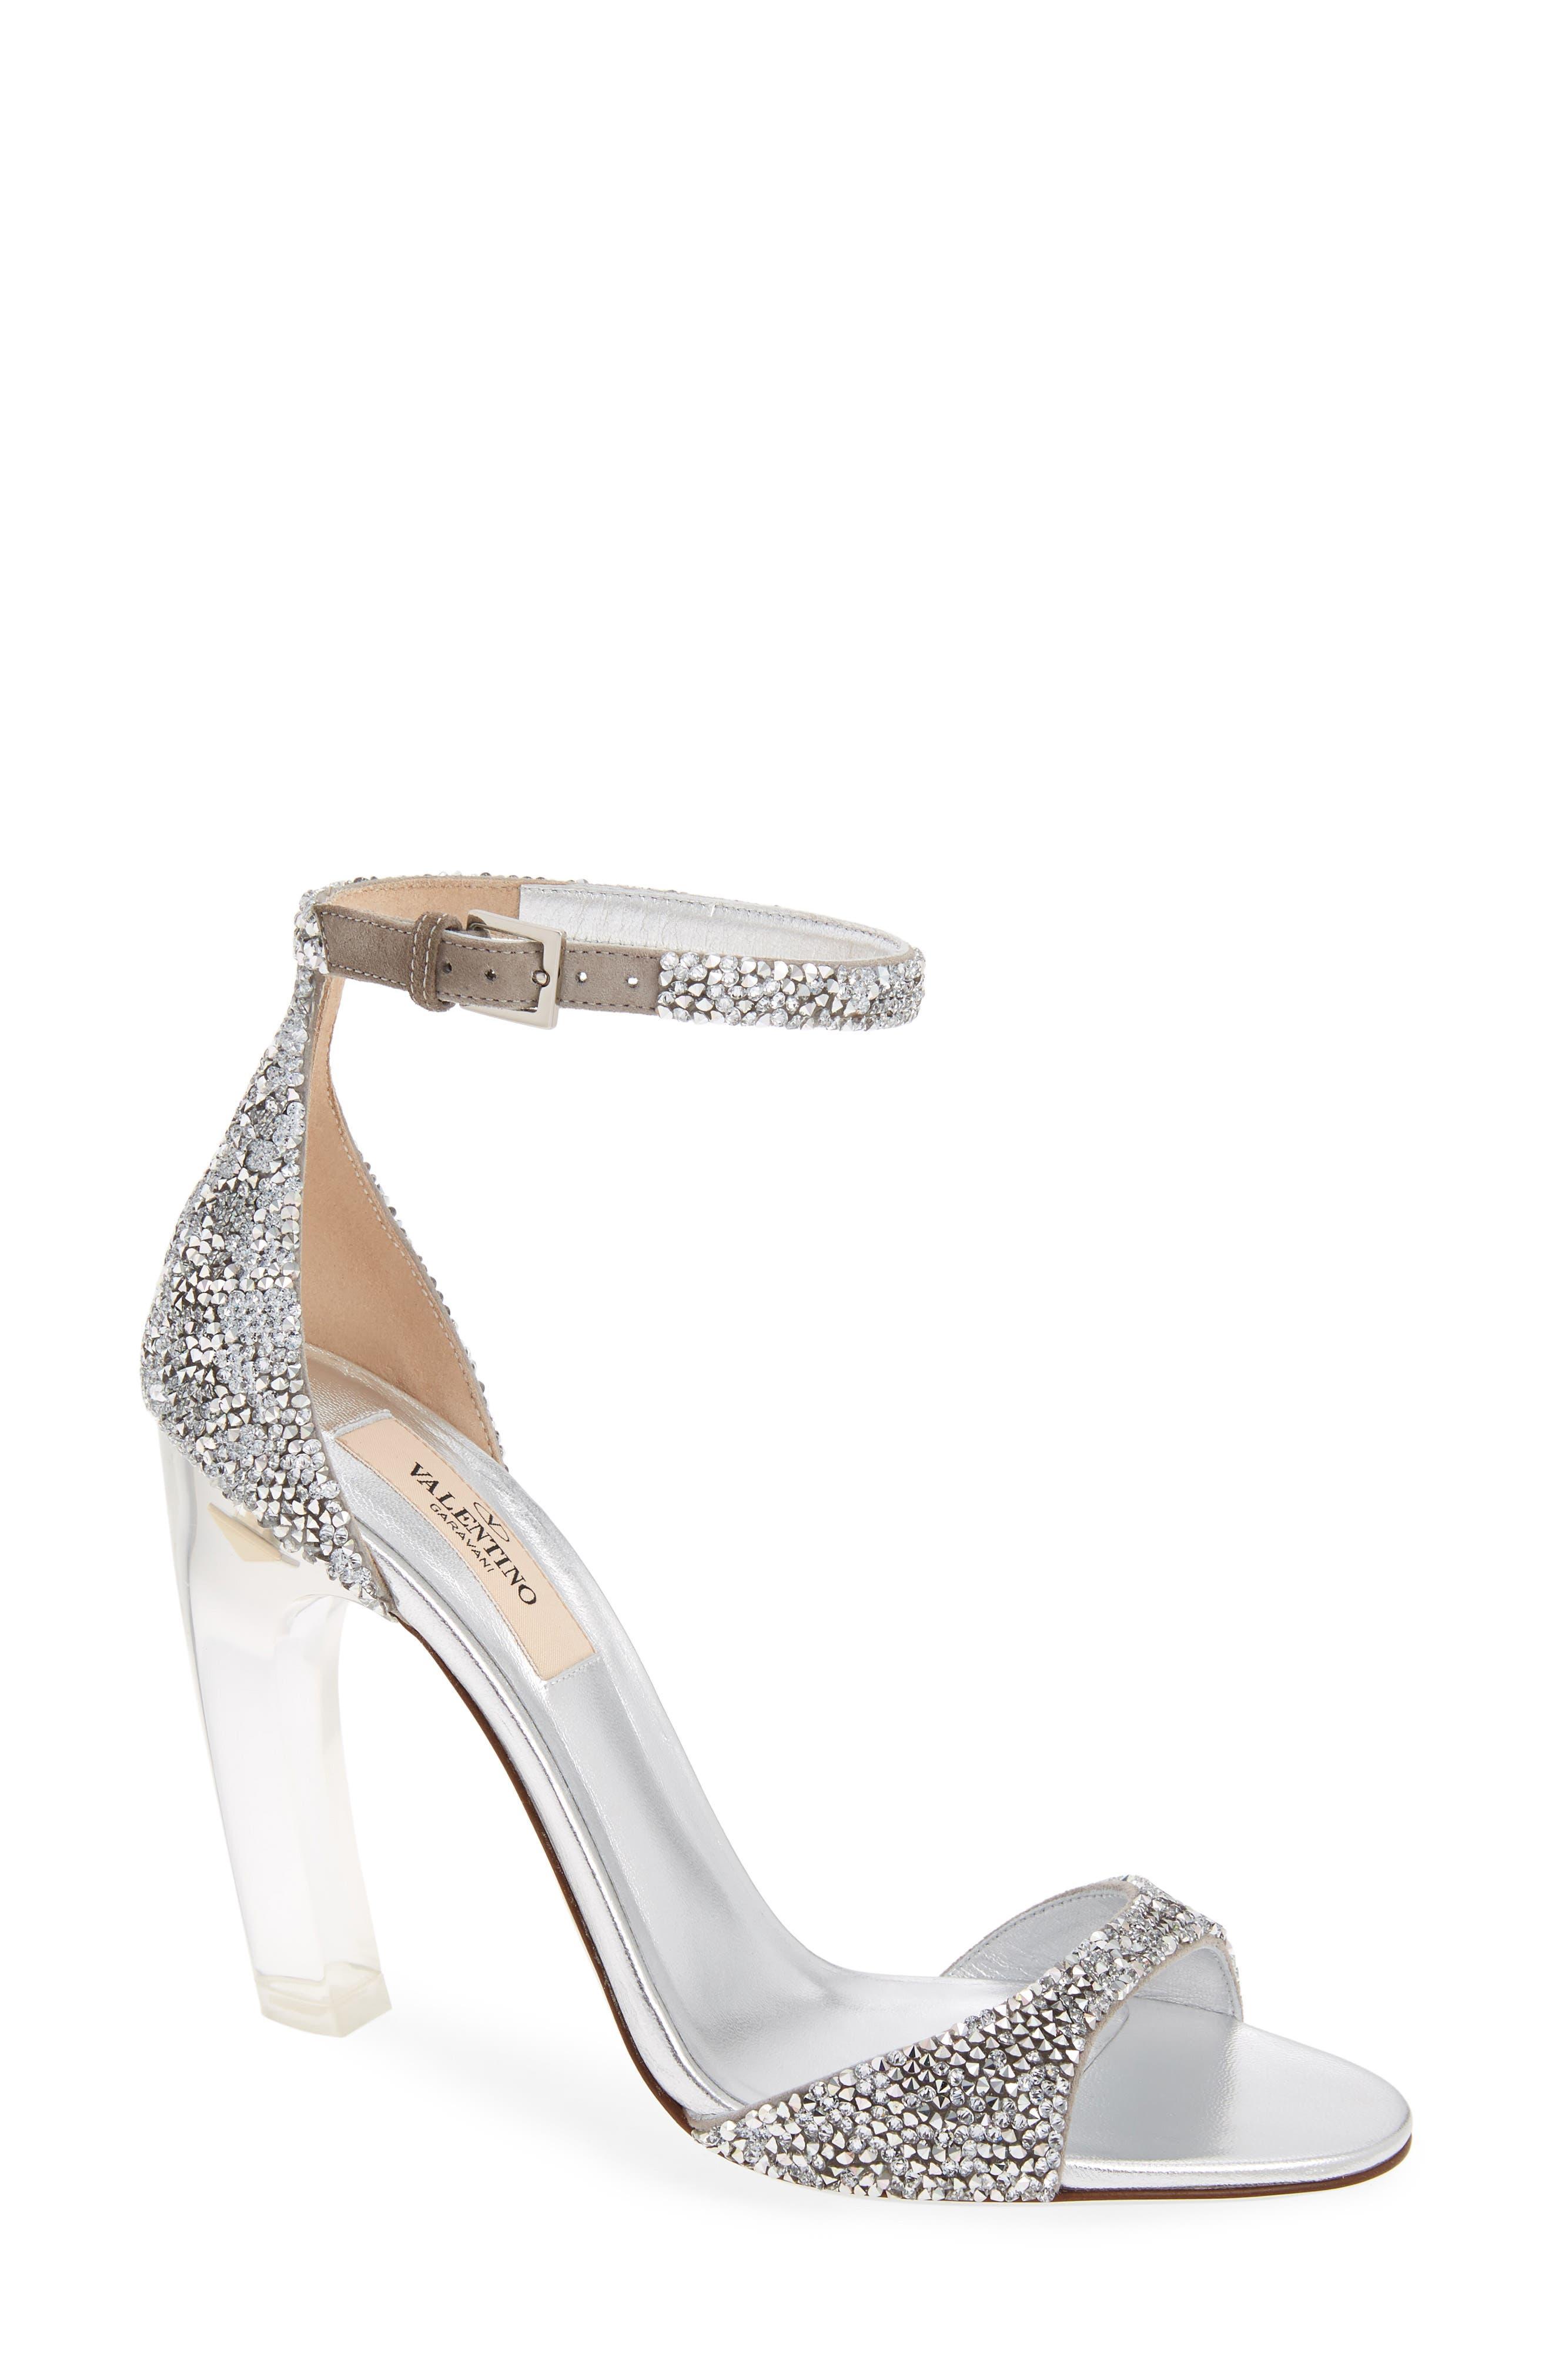 GARAVANI Crystal Embellished Clear Heel Sandal,                             Main thumbnail 1, color,                             Silver